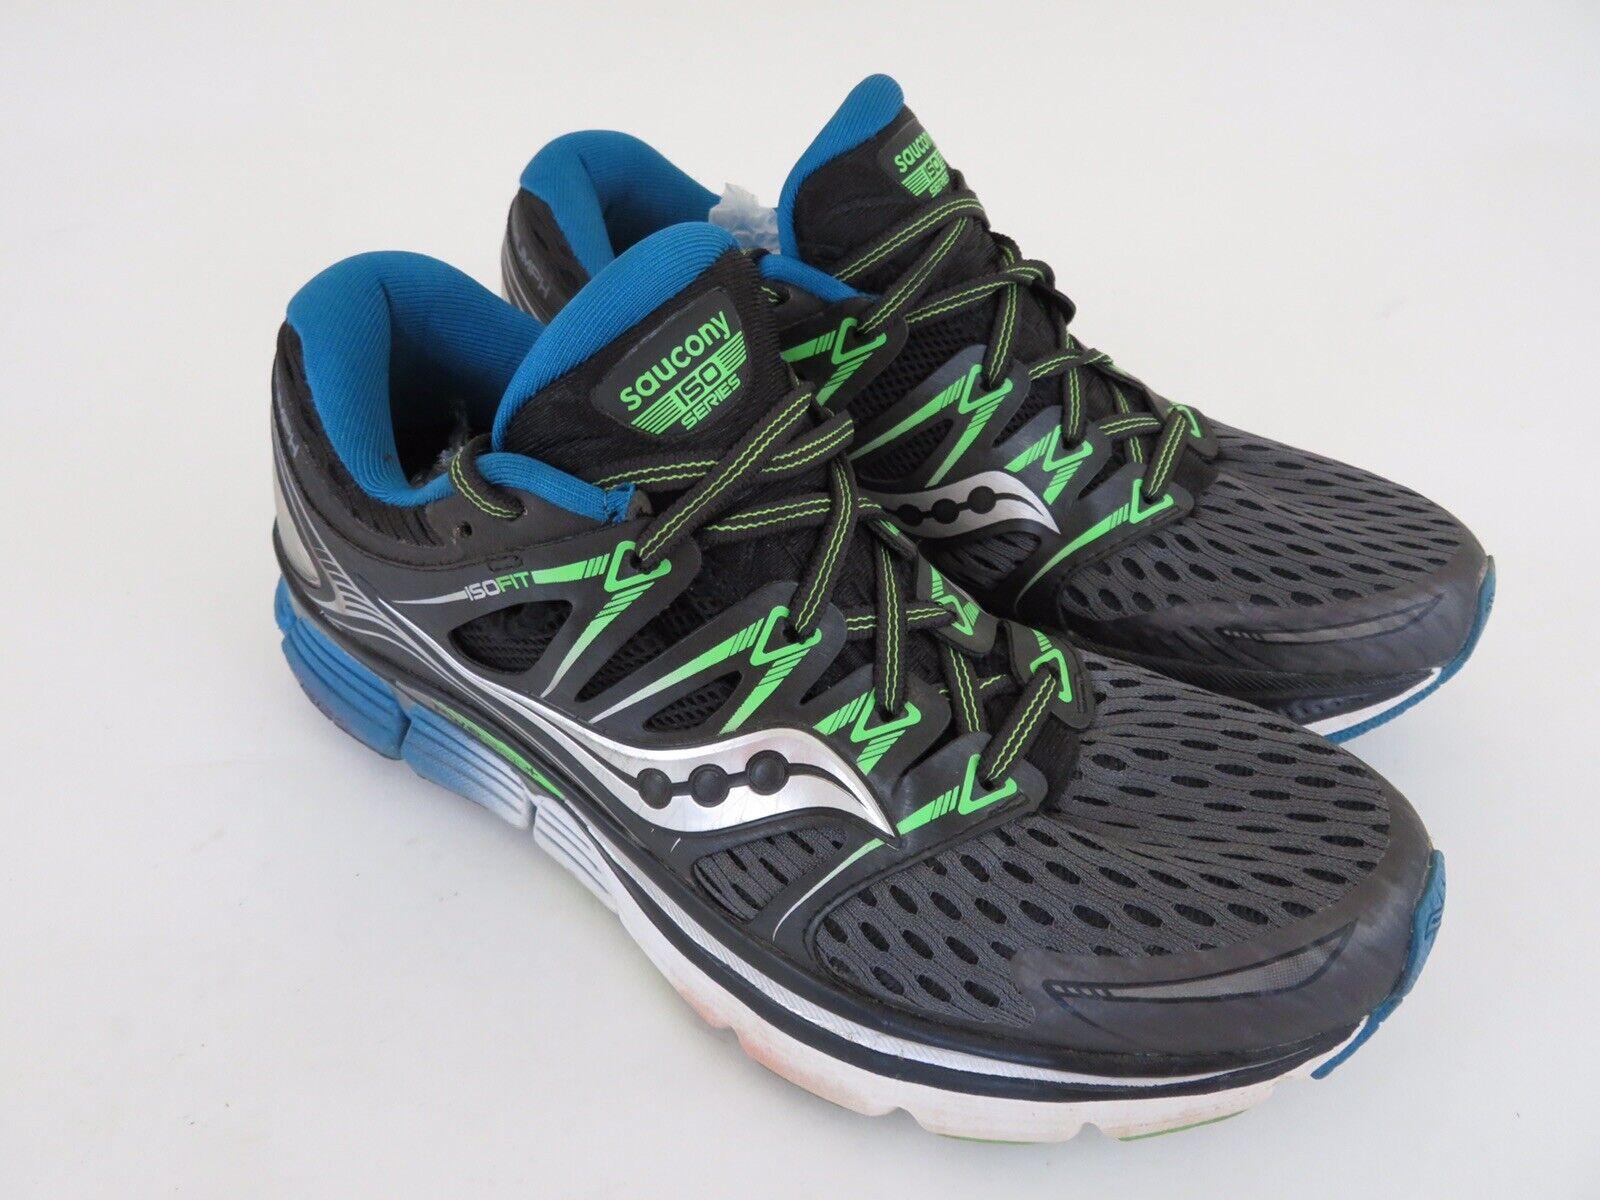 Saucony Triumph ISO para hombre Correr Atléticos Zapatos gris Negro Slime S20262-4